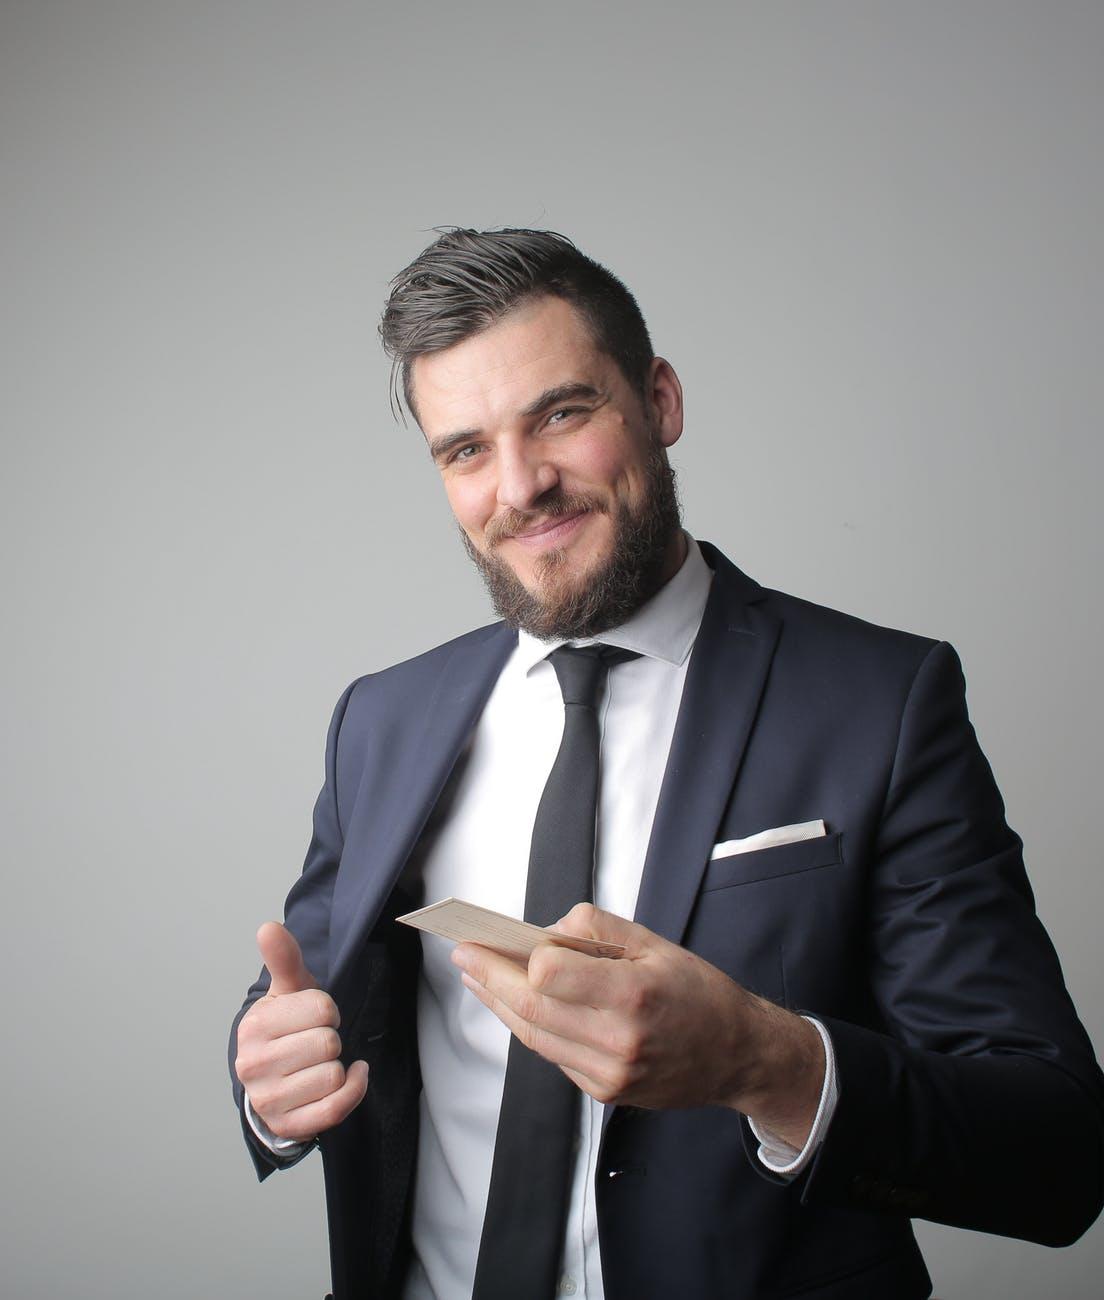 You are currently viewing שותפות עסקית – כל מה שרציתם לדעת